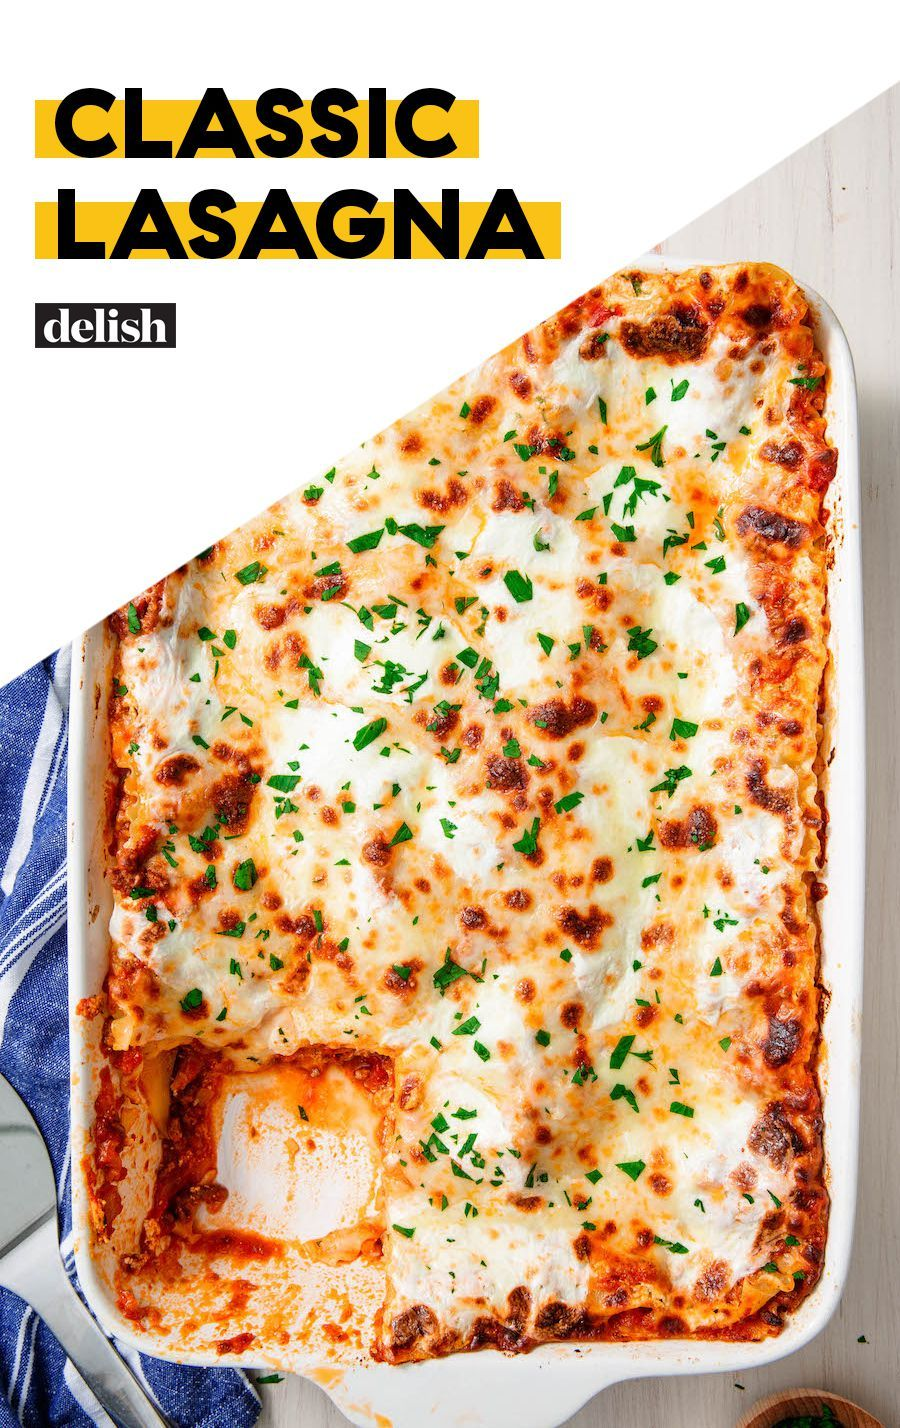 Classic Lasagna images